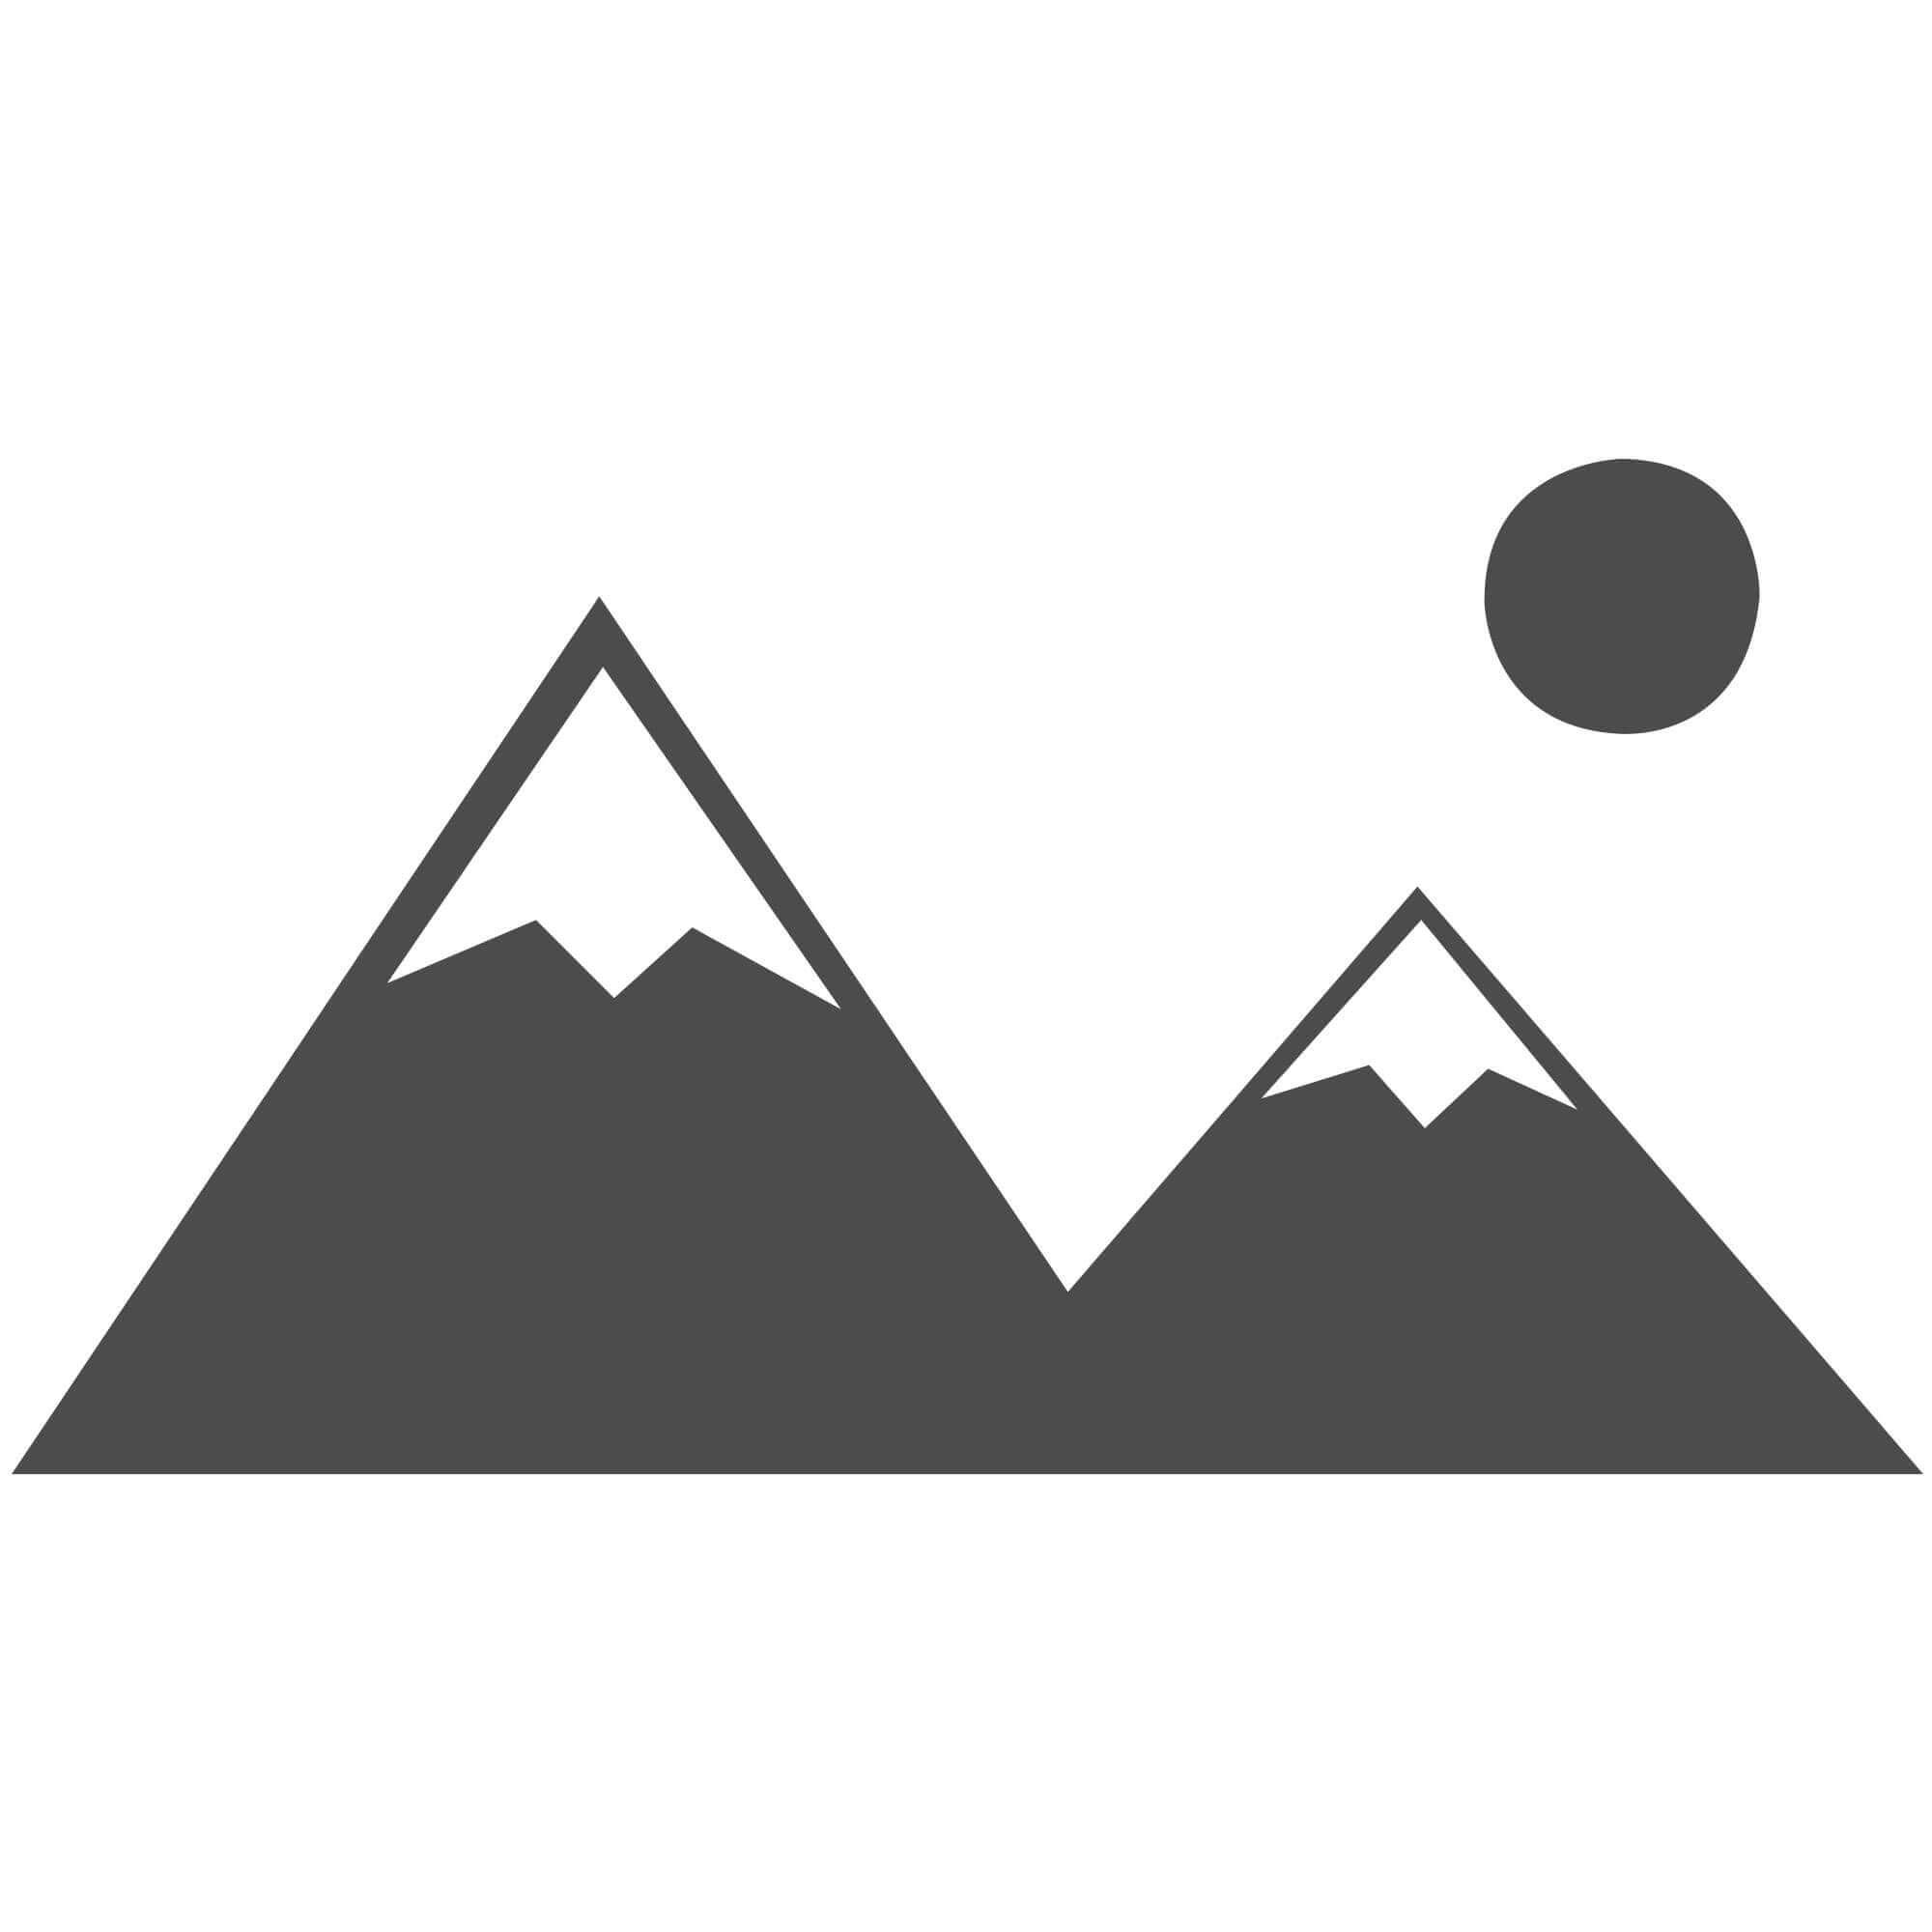 "Velvet Bijoux Rug - Red Brown - Size 120 x 170 cm (4' x 5'7"")"